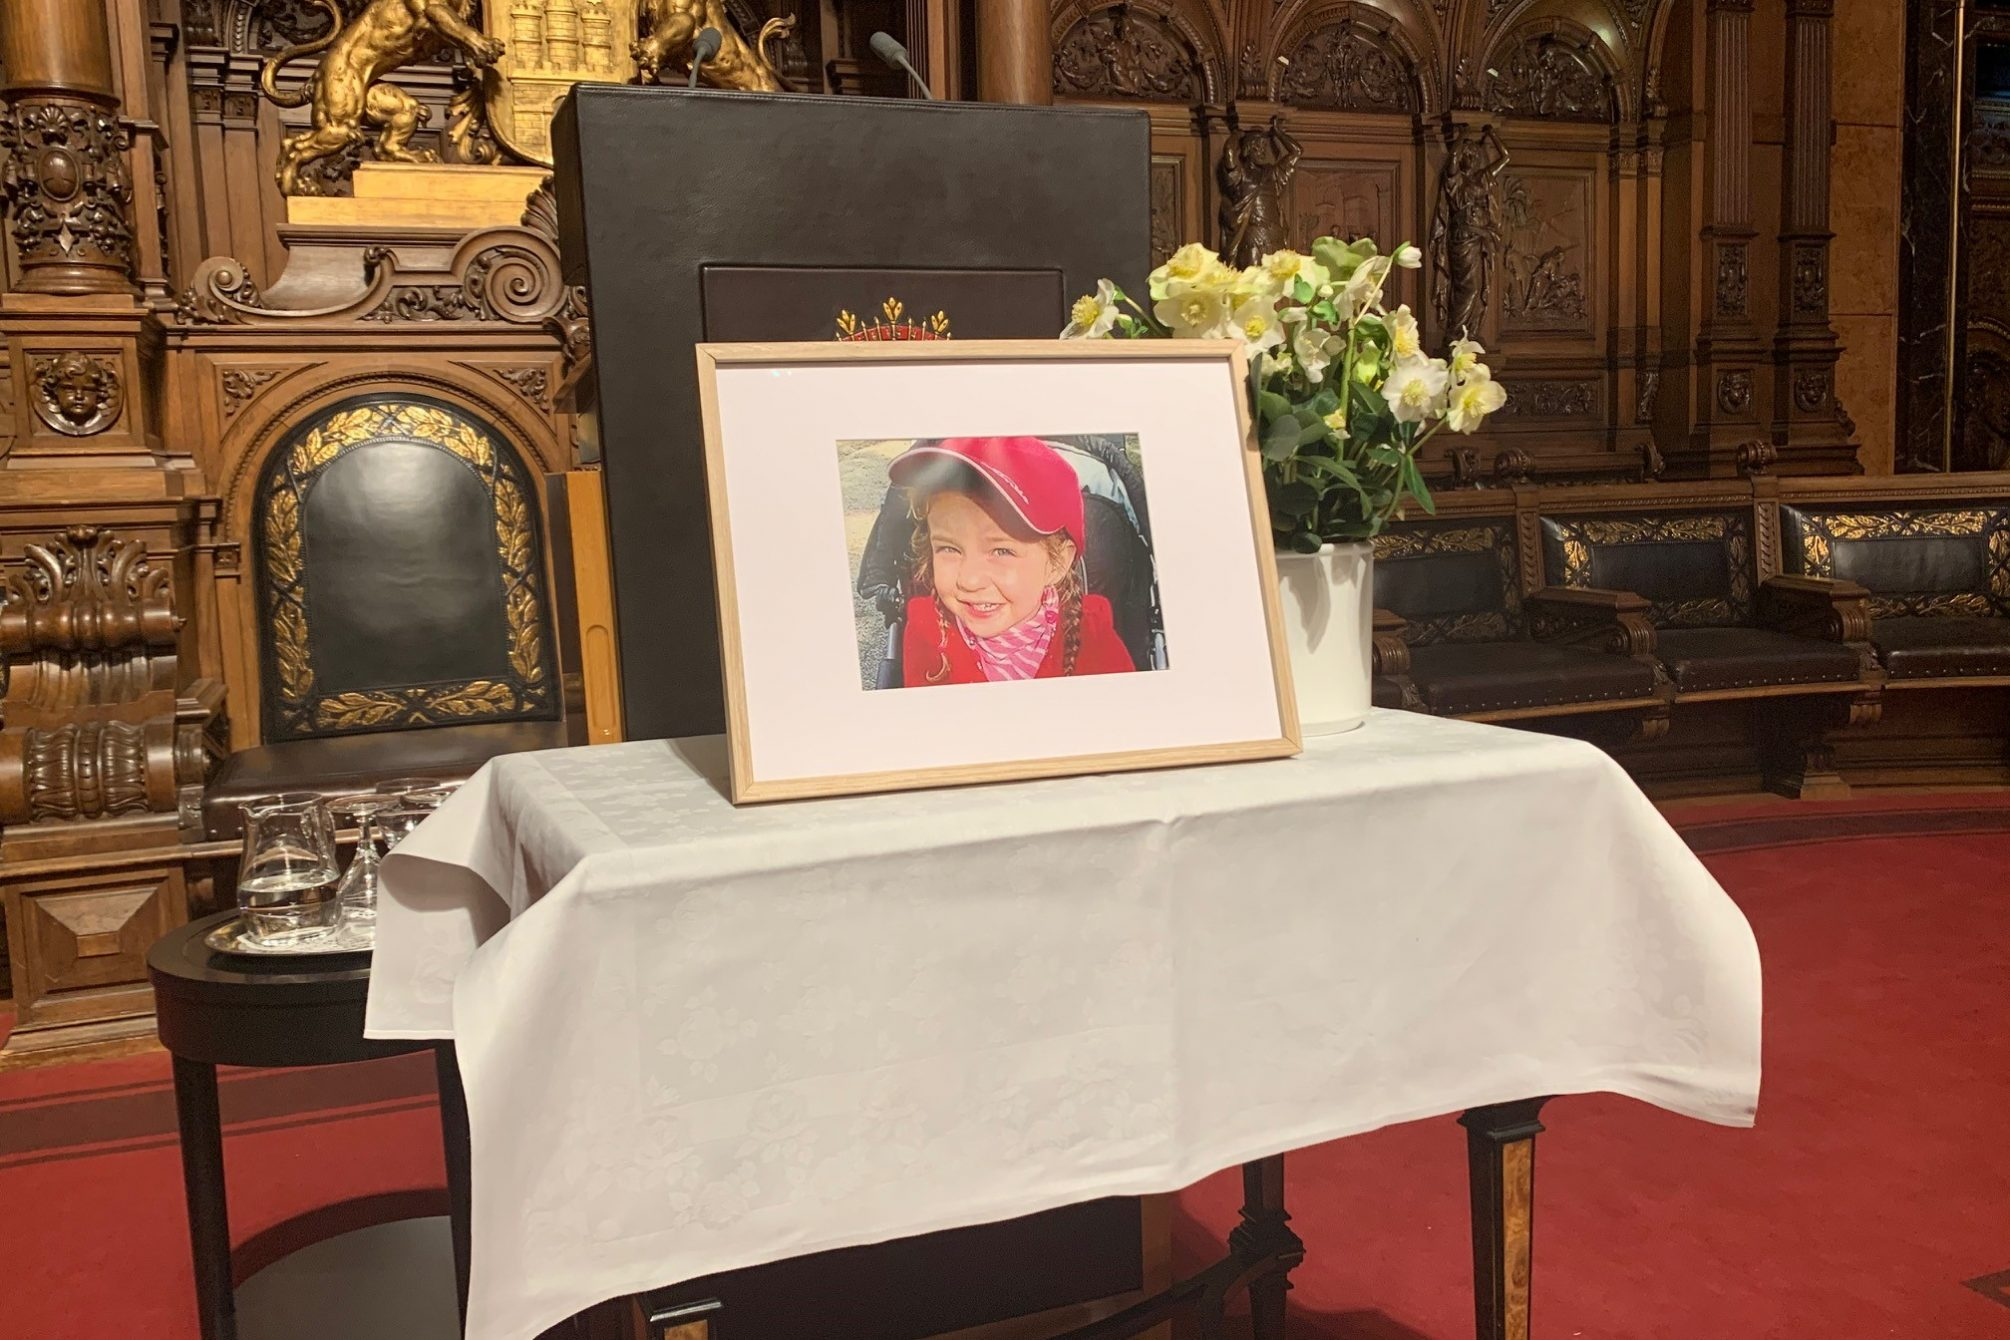 Bild des getöteten Mädchens Yagmur